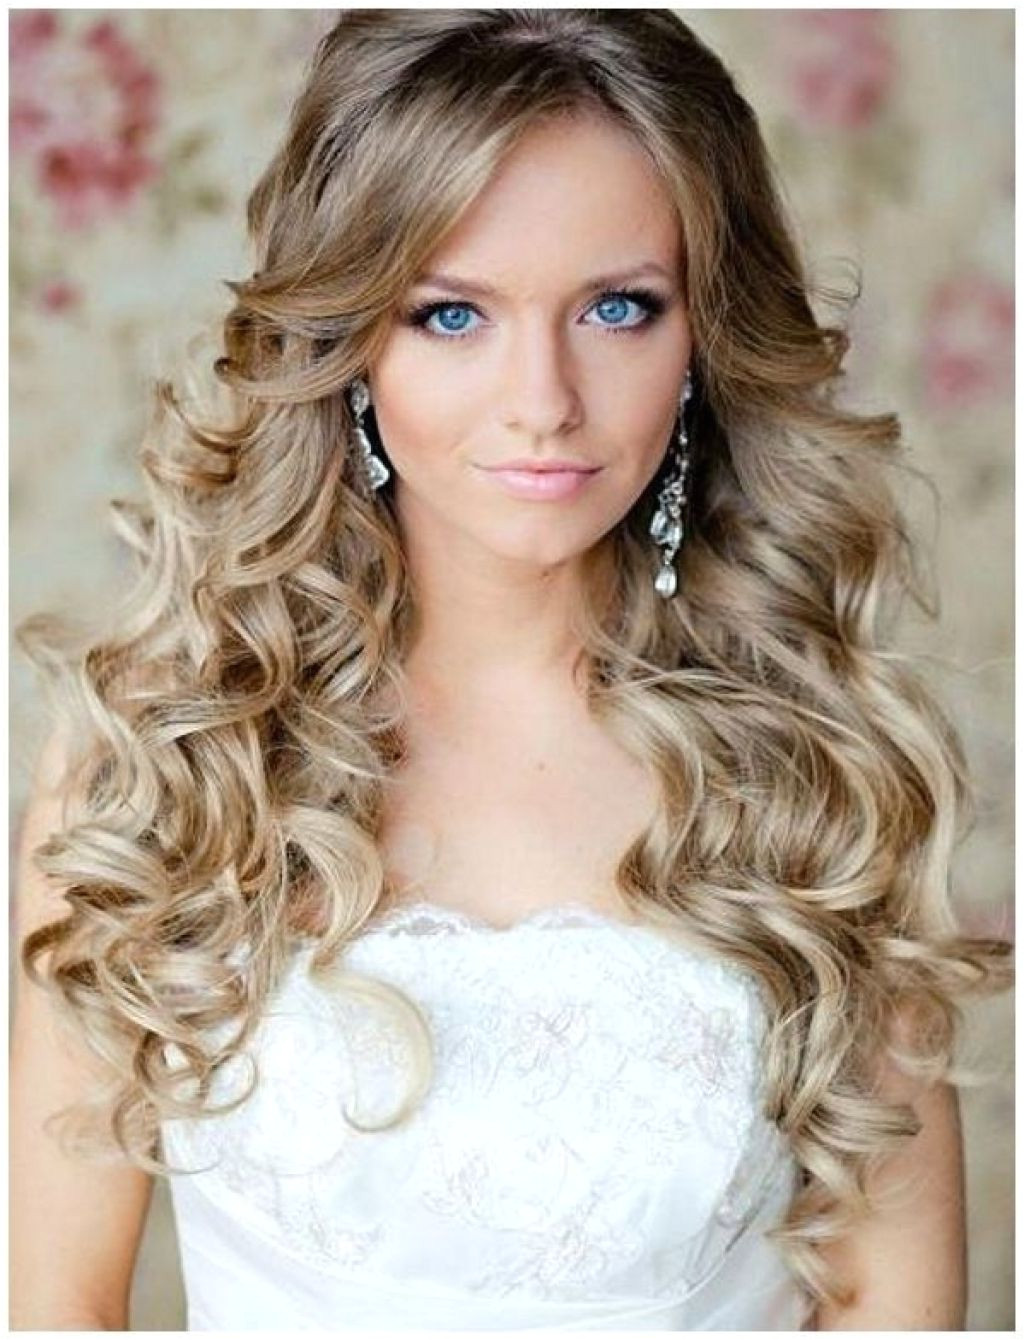 Simple Hairstyles Curls Wedding Guest Hairstyles with Bangs Simple Wedding Hairstyles Simple